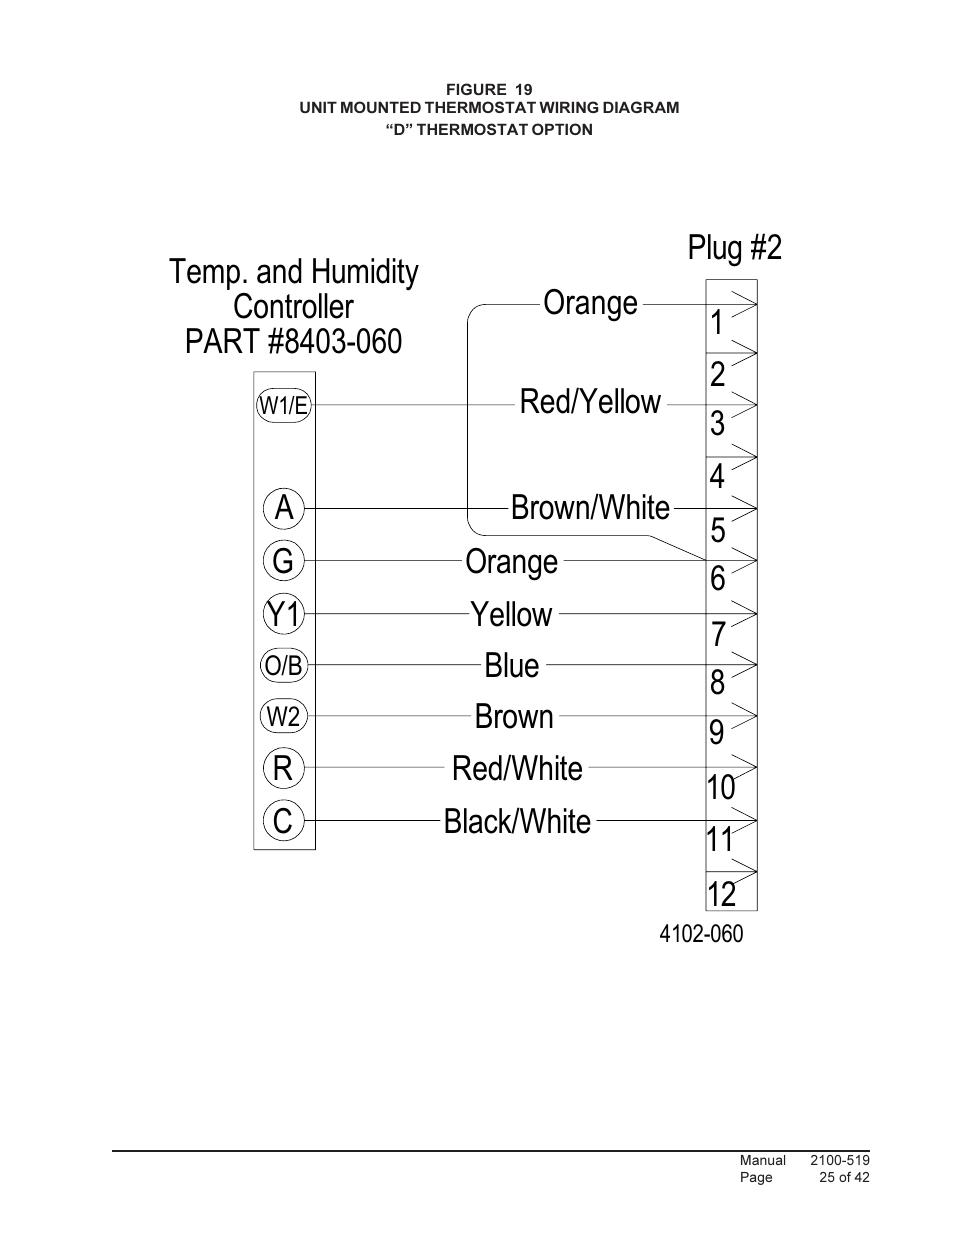 medium resolution of 2orange red white blue 9 ry1 plug 2 c bard qtec series